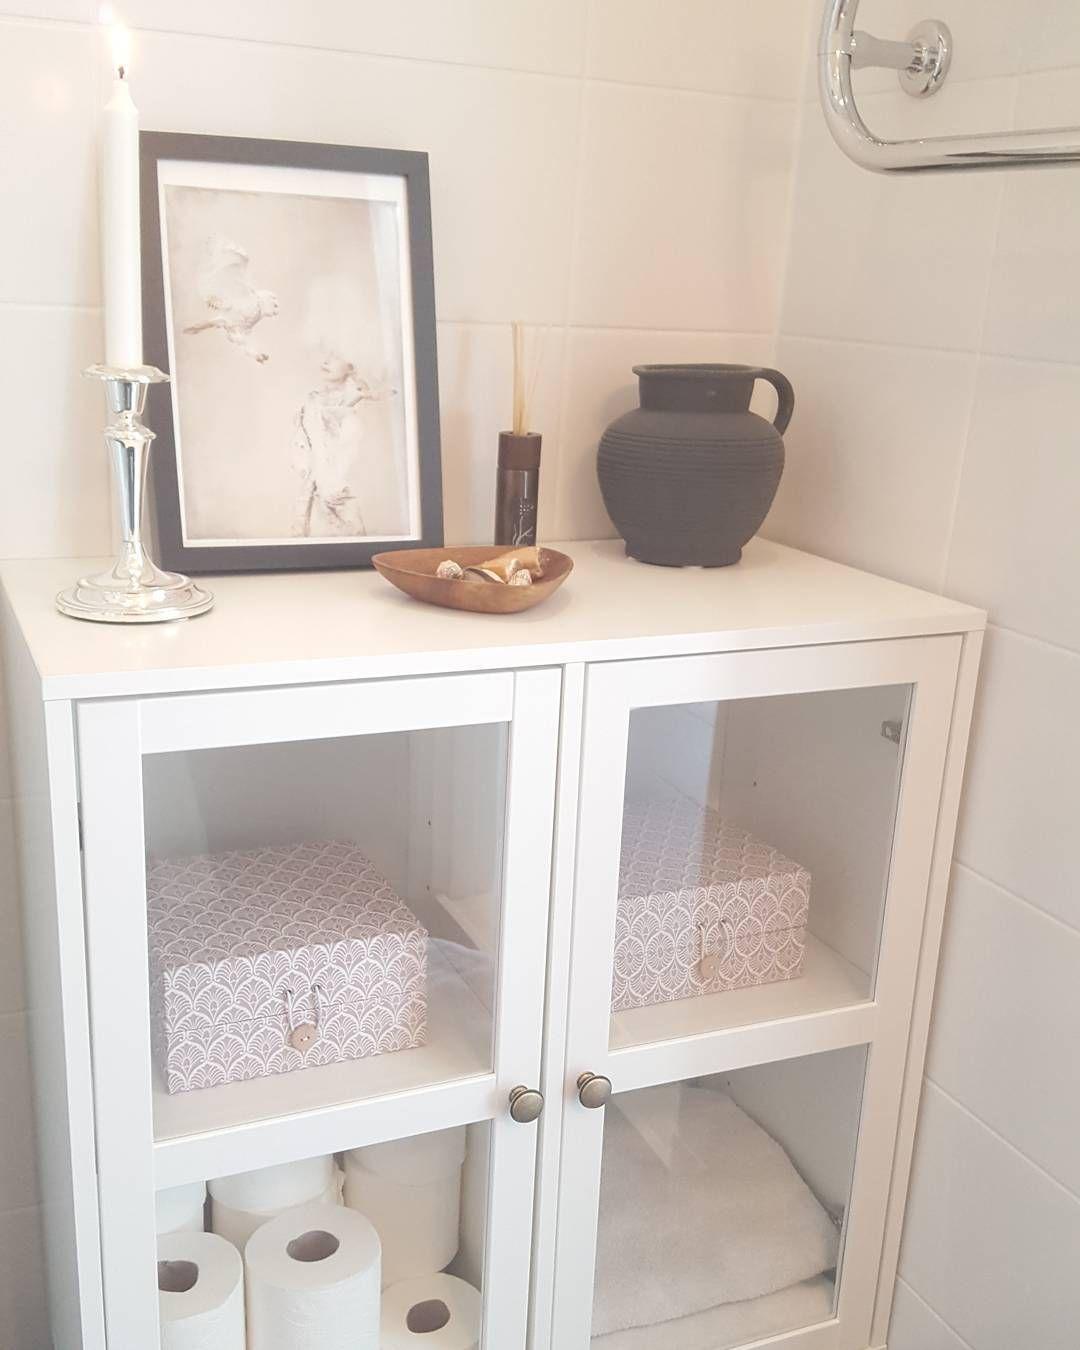 Superieur Guest Bathroom #myhome #tovefrank #rituals #vintage #jysk #mitteksjöhus